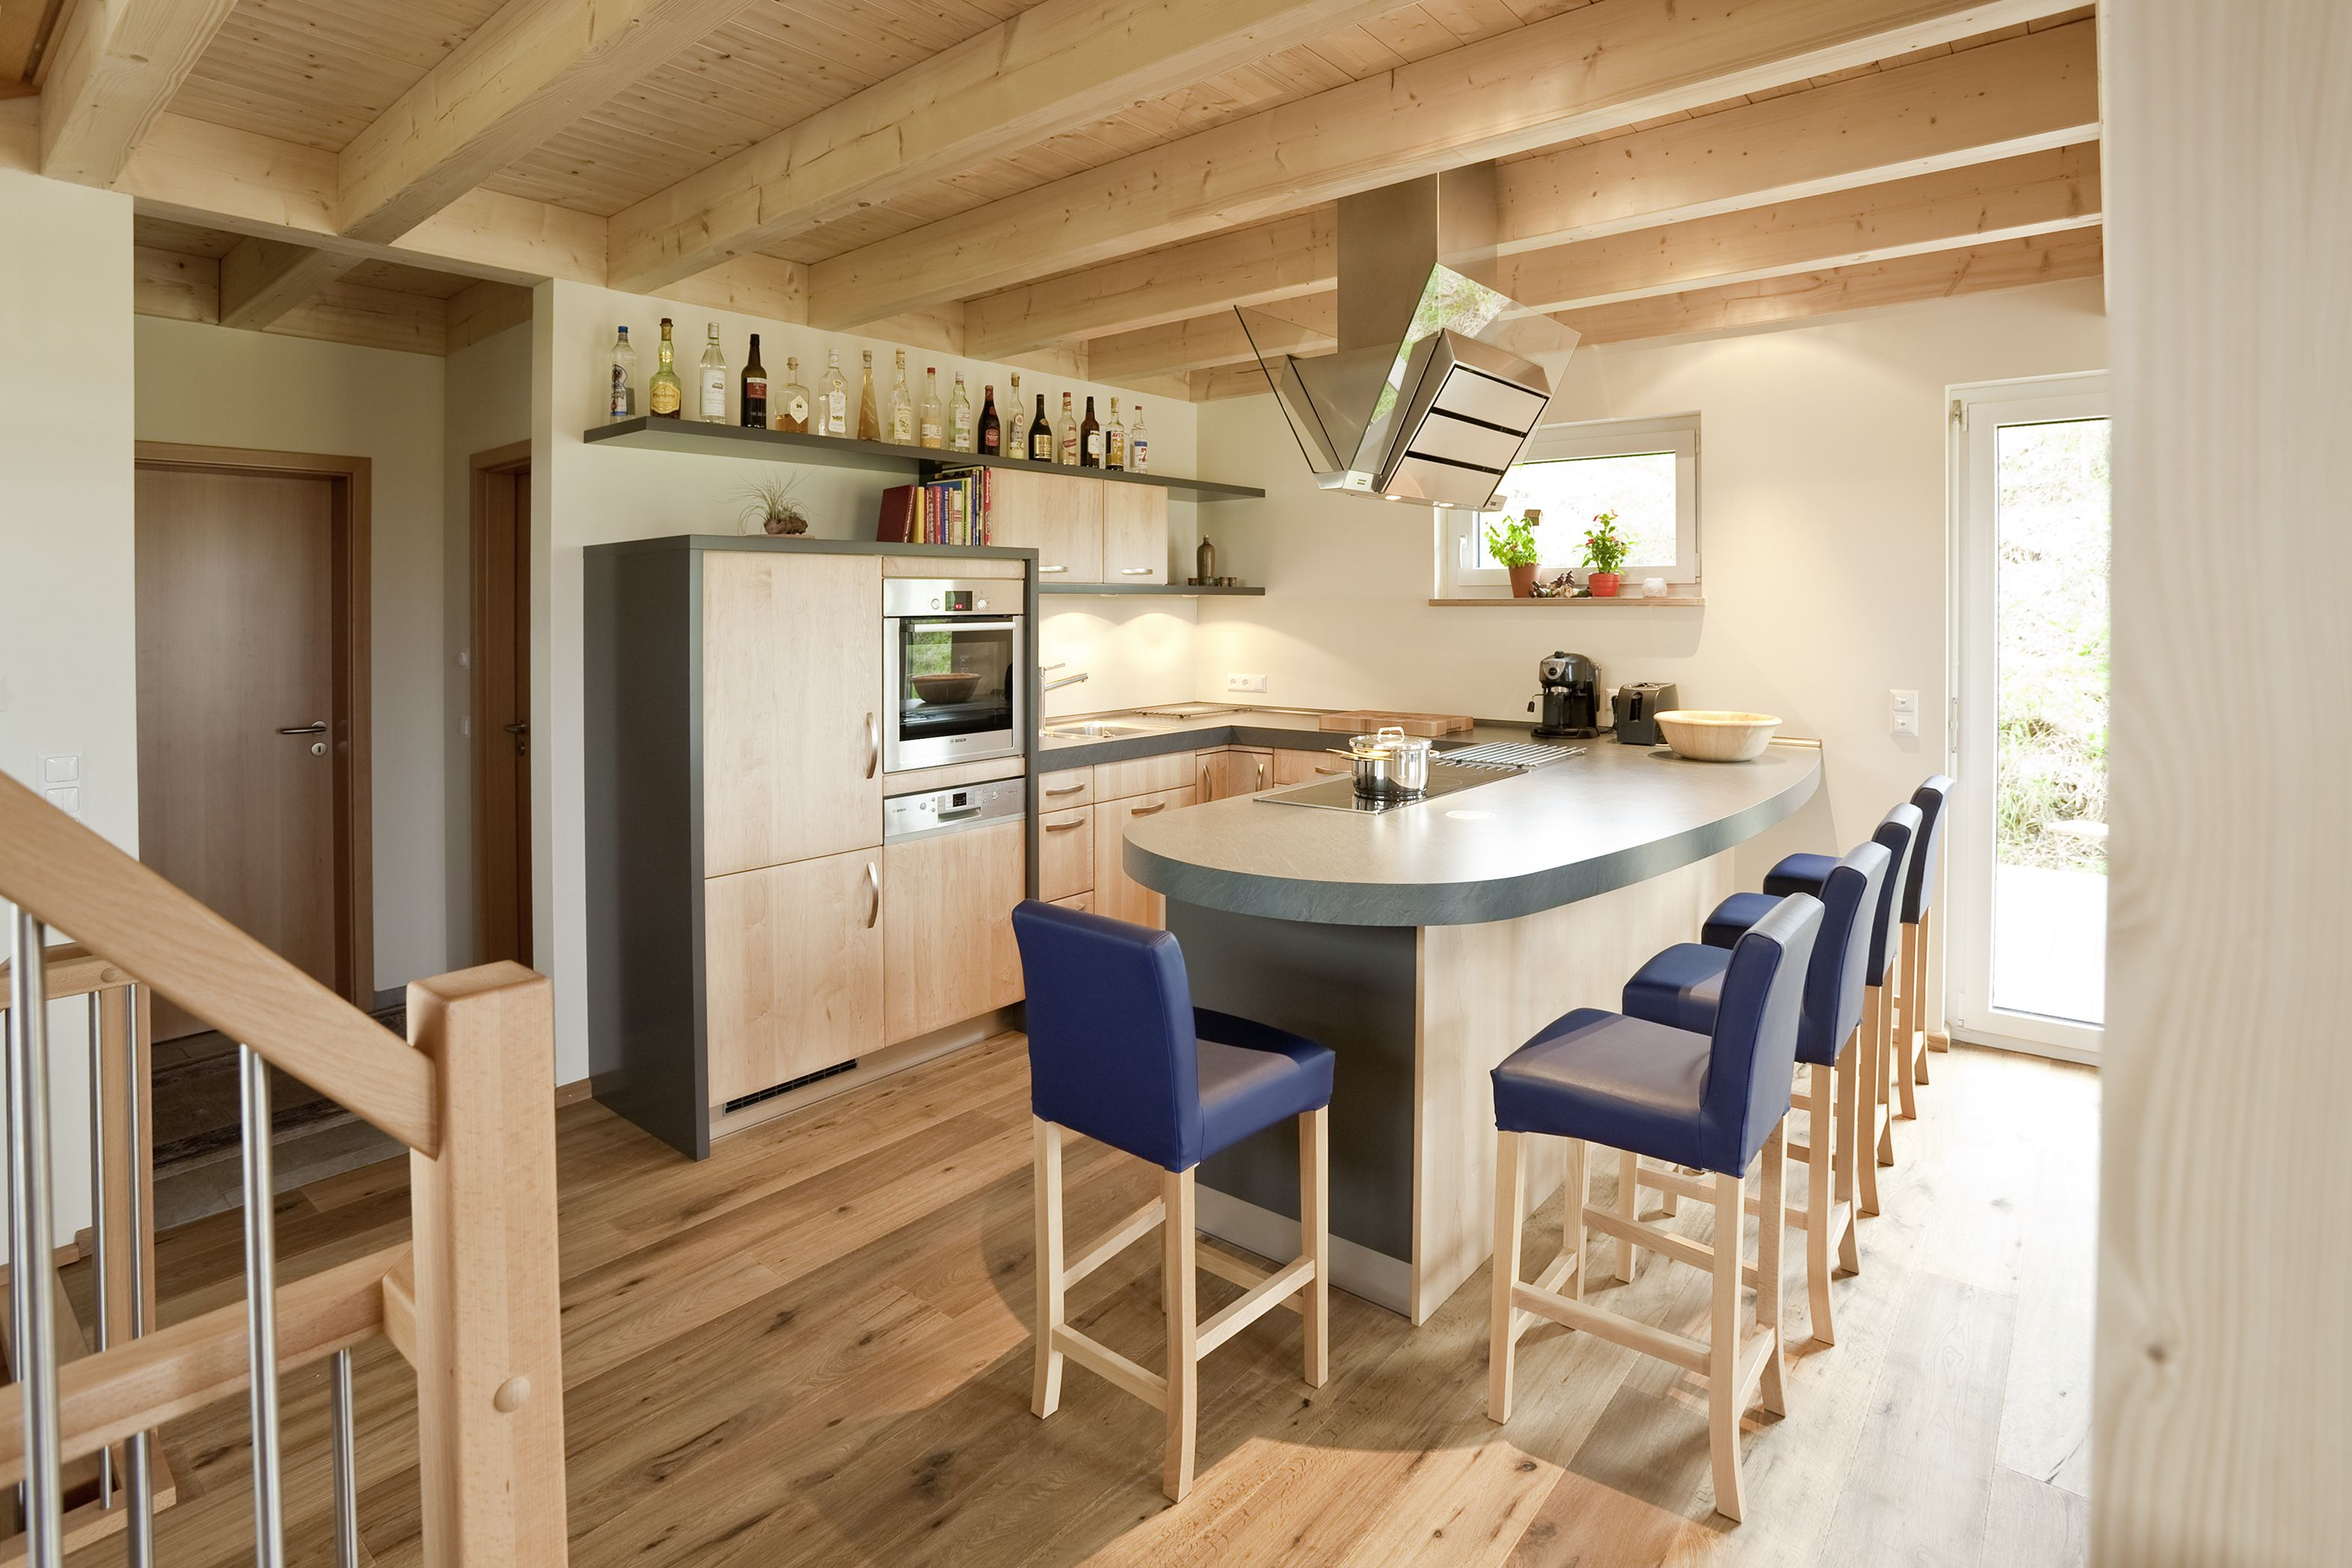 offene Küche im hellen Holzhaus, Holzhaus, Holz, Theke, Küche ...